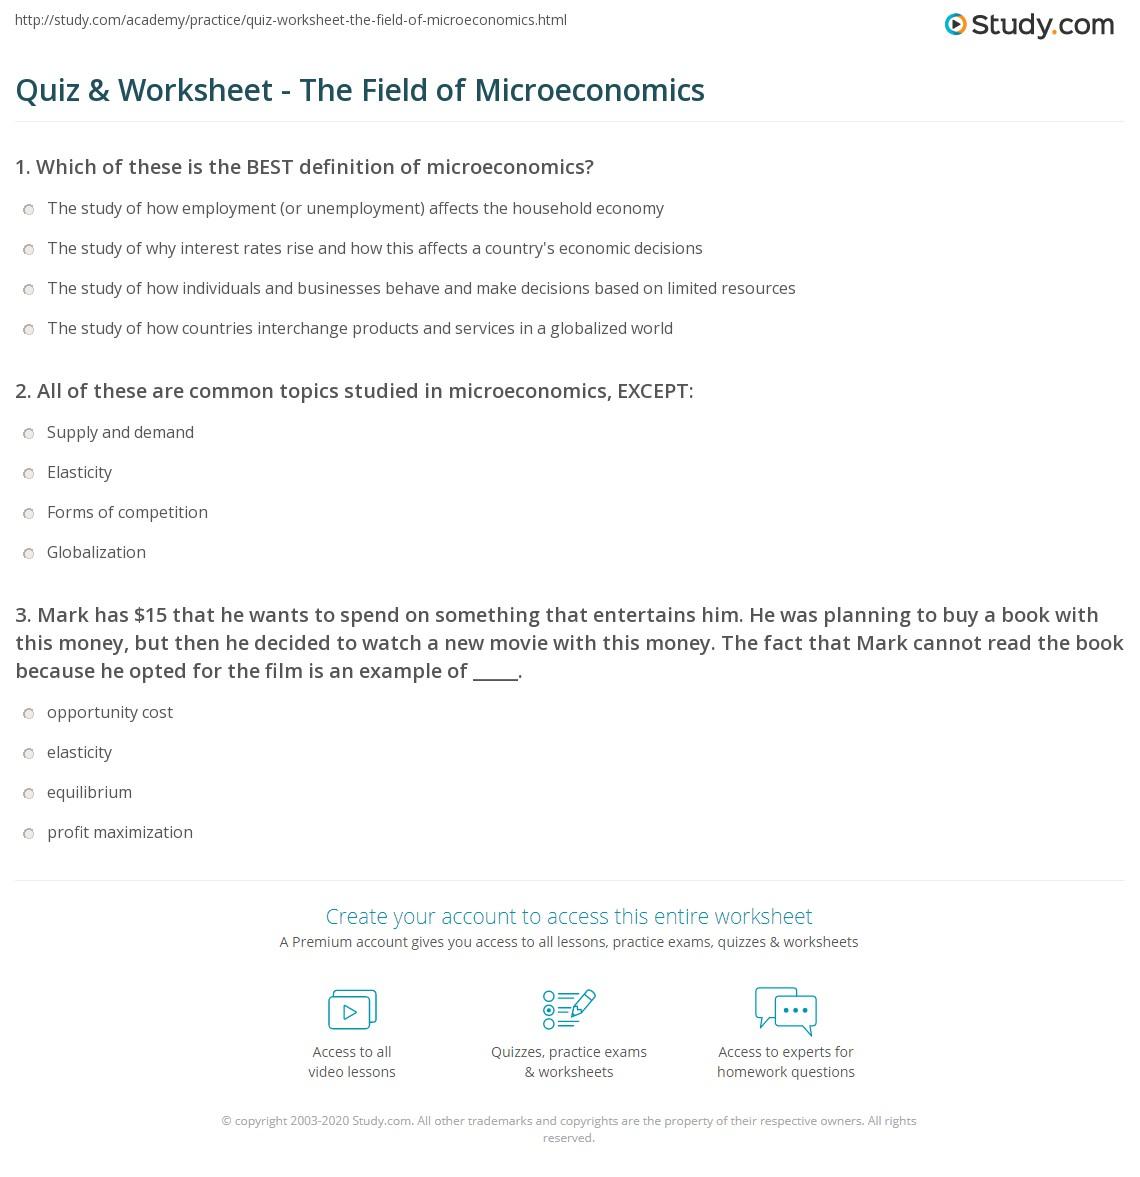 Quiz & Worksheet - The Field of Microeconomics | Study com